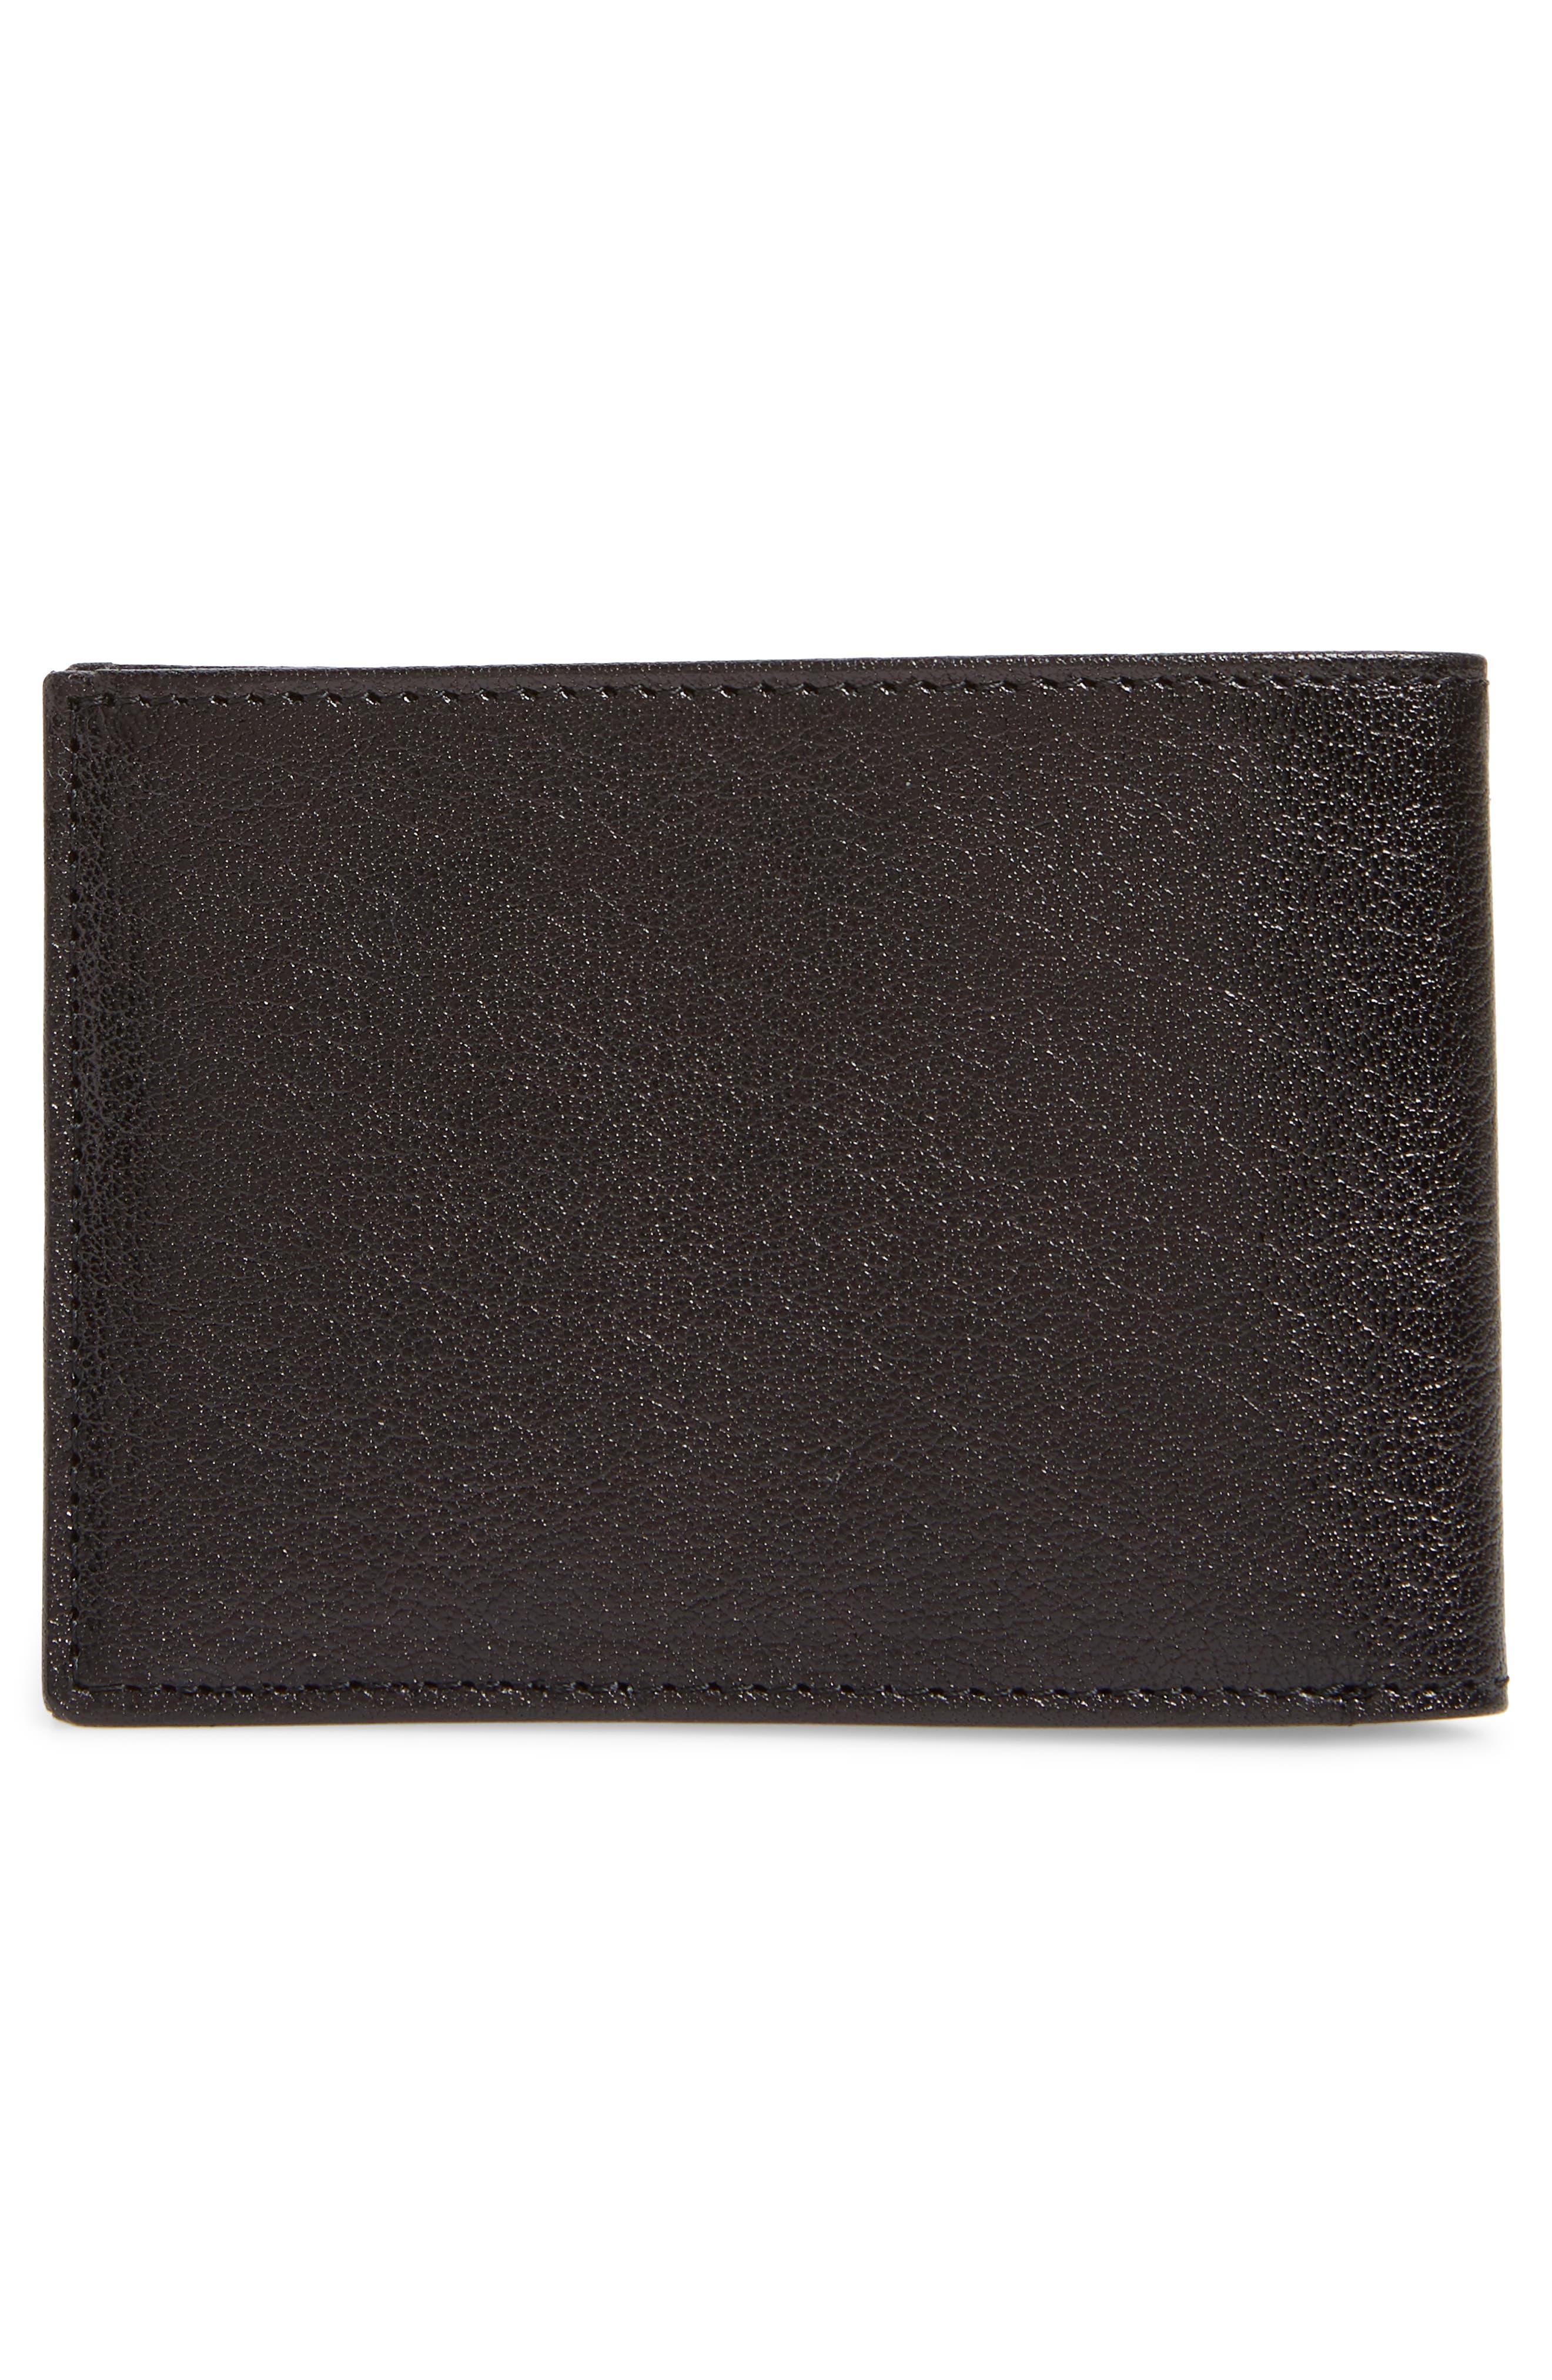 Landon Slim Leather Wallet,                             Alternate thumbnail 3, color,                             001